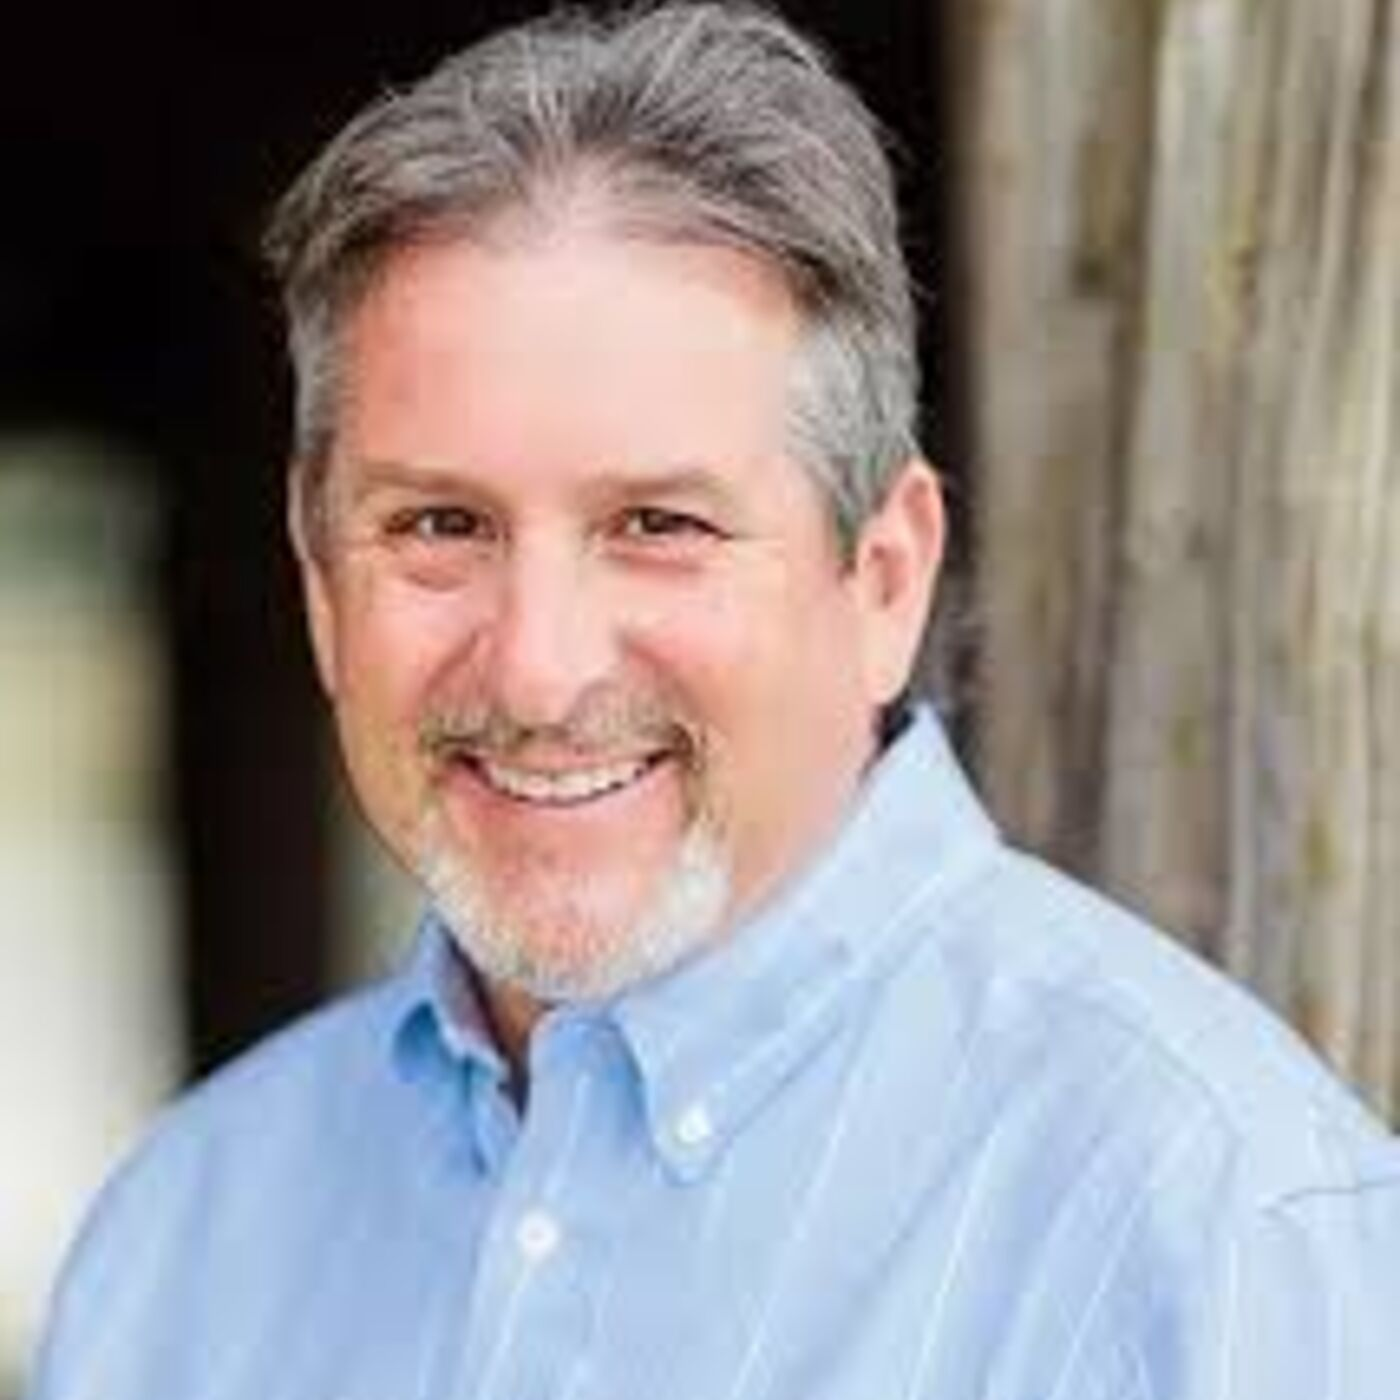 Medical Device Reps Podcast: Dr. Greg Vecchi/Former BSU FBI Chief